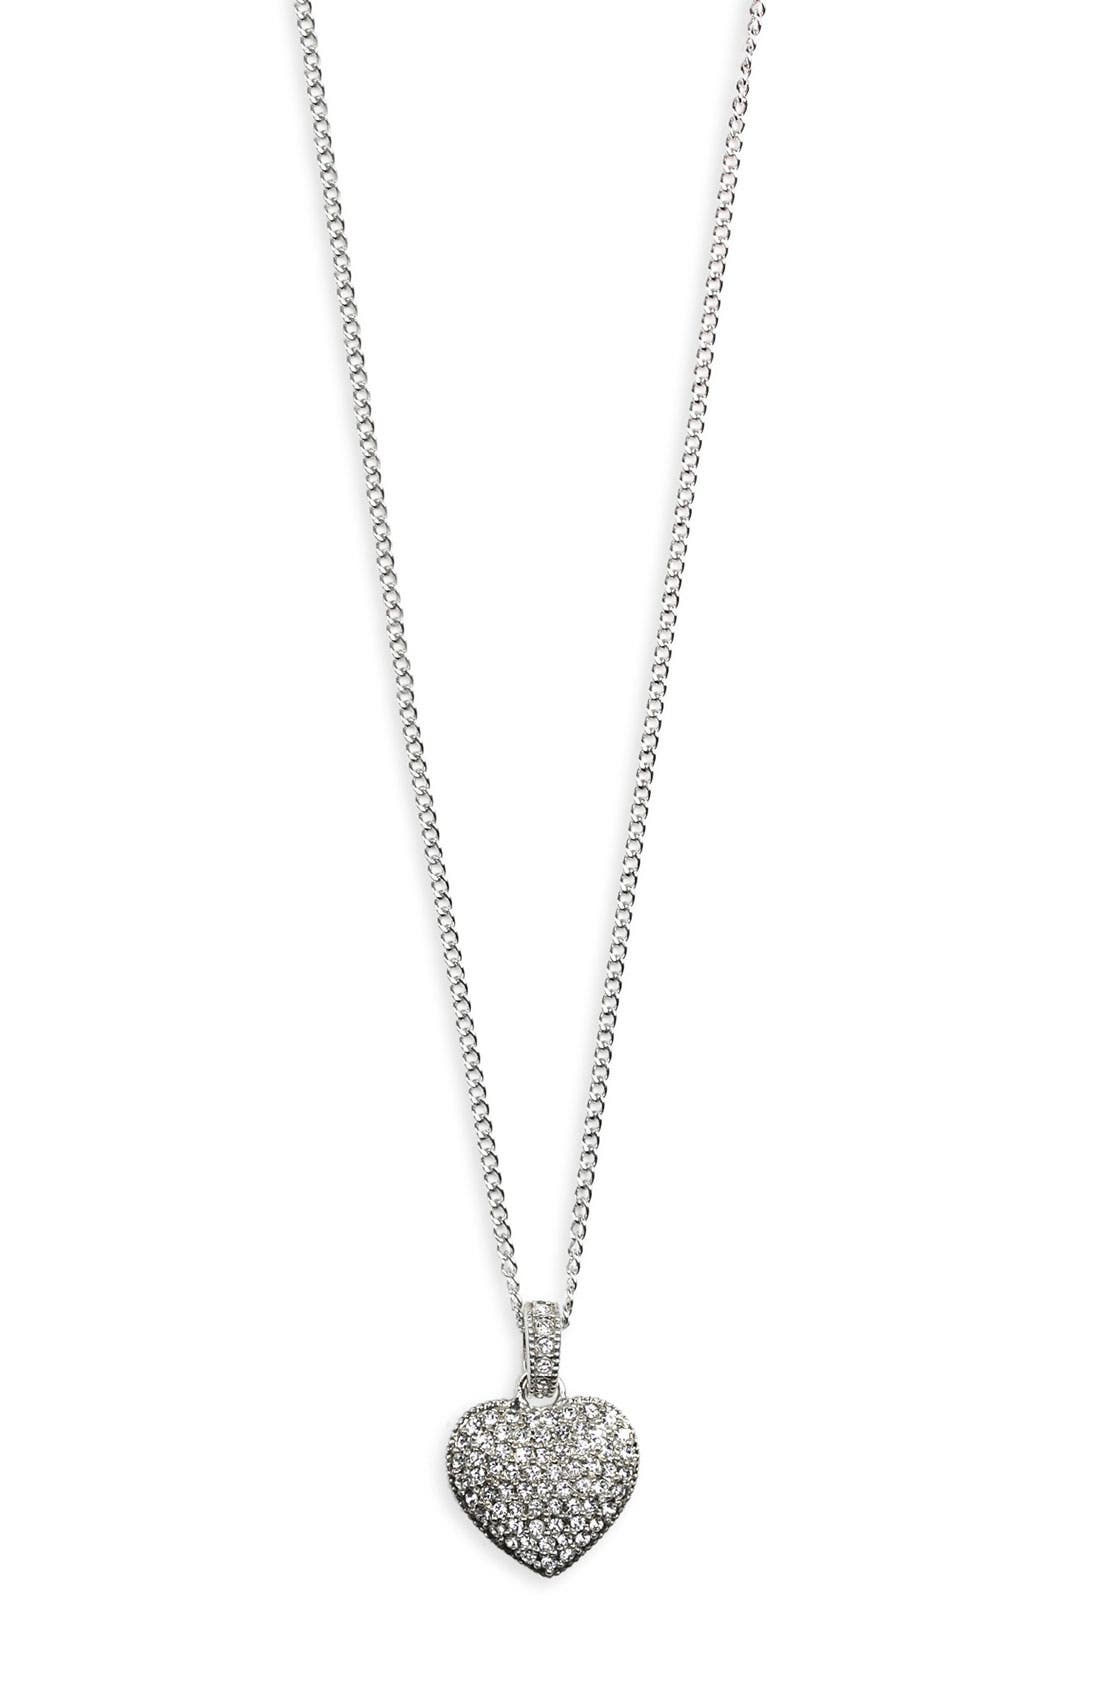 Alternate Image 1 Selected - Judith Jack Reversible Pavé Heart Pendant Necklace